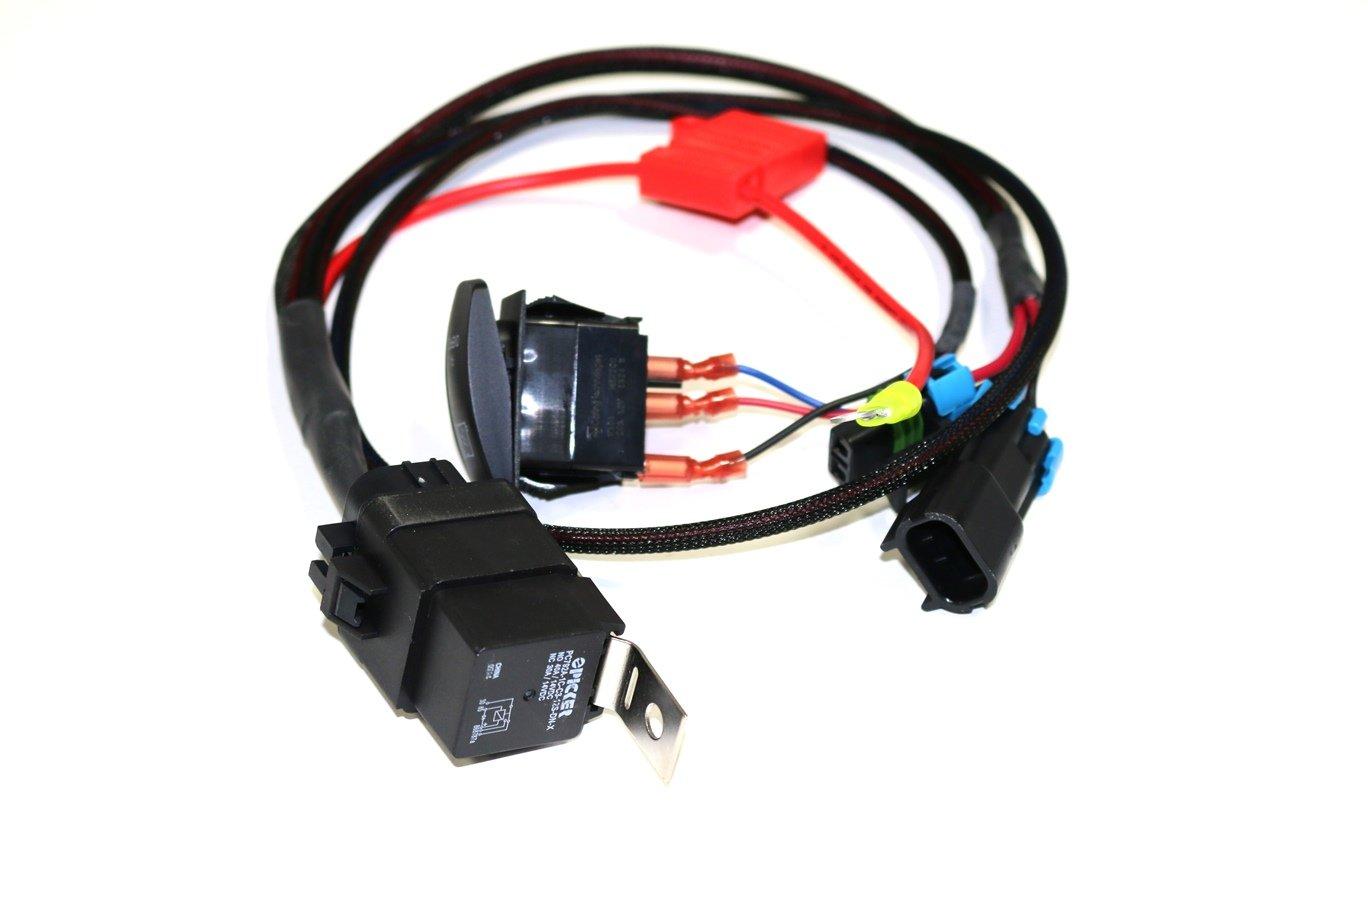 XTC Power Products Premium 2016 Polaris Turbo RZR XP1000 Manual Fan Override Switch Kit XTC Motorsports 16RZR-T-FAN-OVR